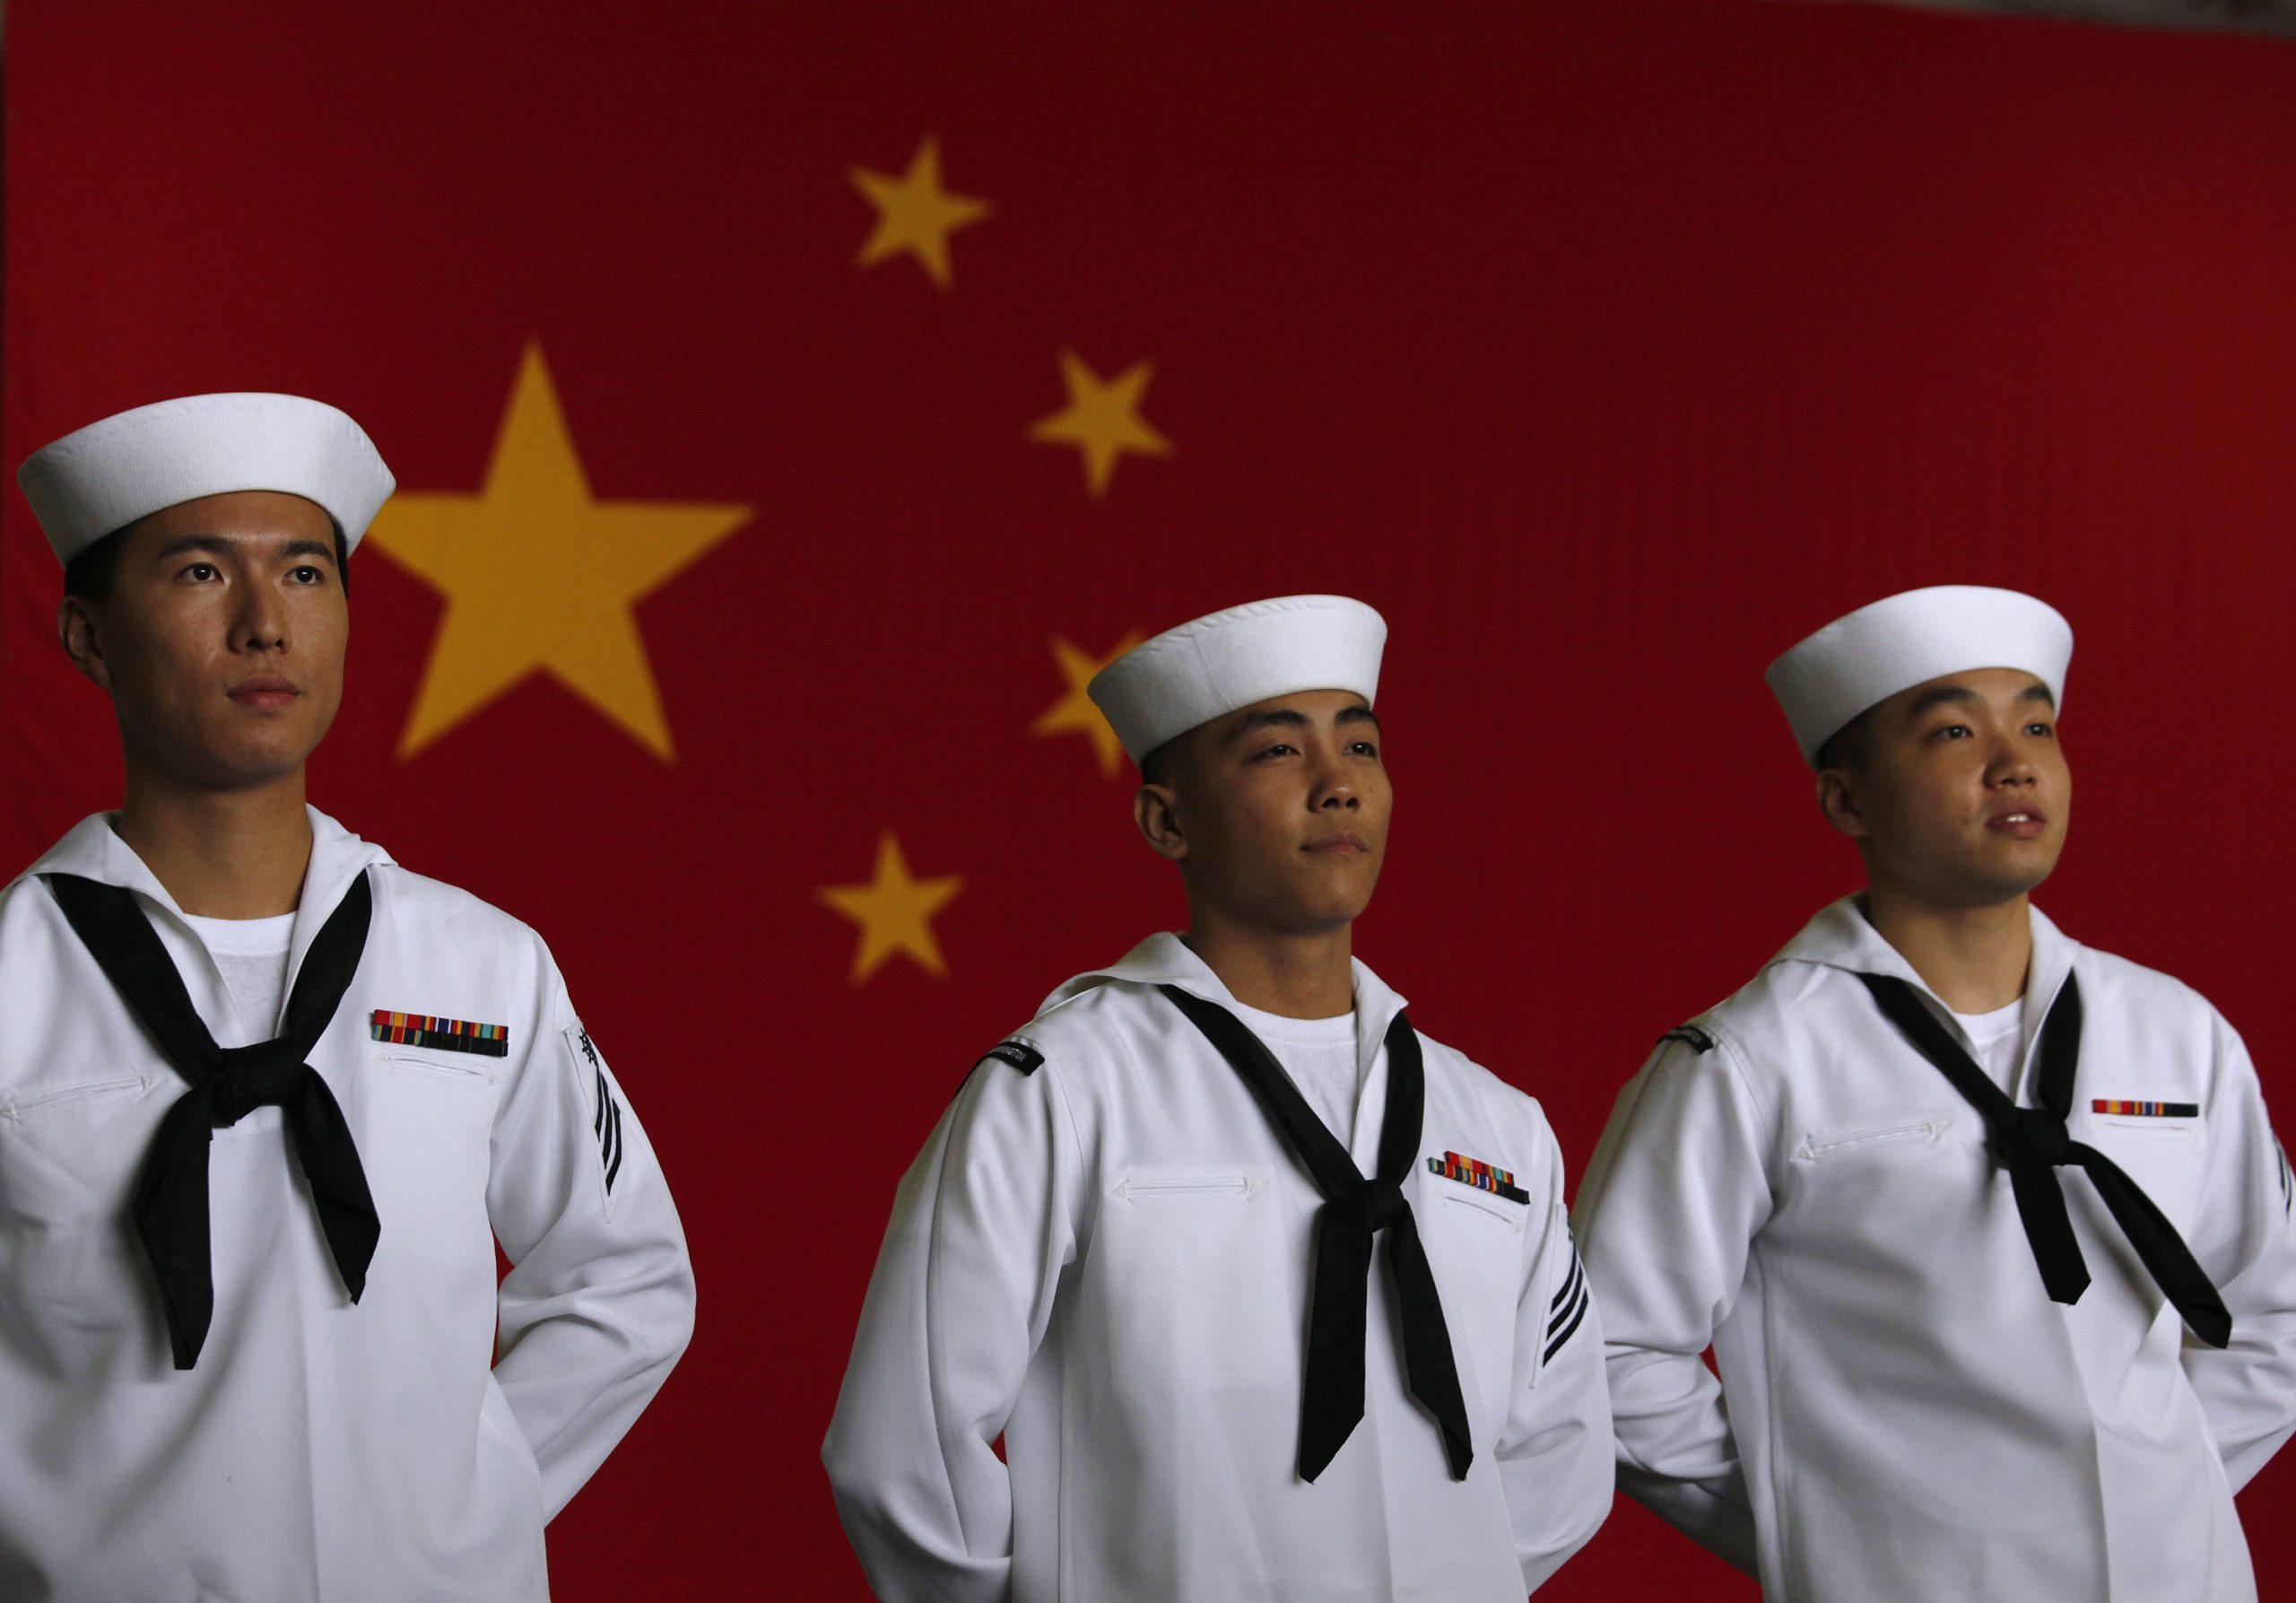 2011_11_China-Military.width-3000.jpg